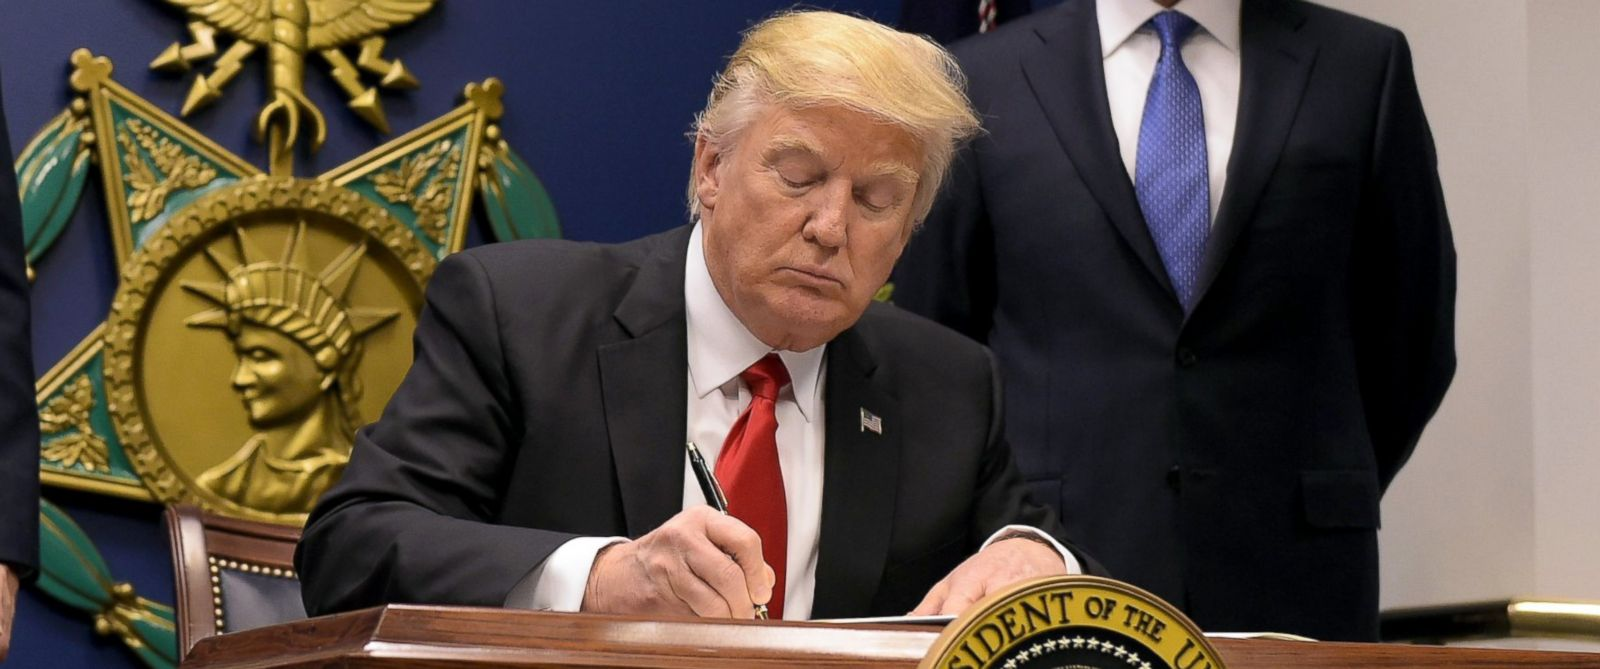 PHOTO: President Donald Trump signs an executive order alongside US Defense Secretary James Mattis and Vice President Mike Pence, Jan. 27, 2016 at the Pentagon in Washington.